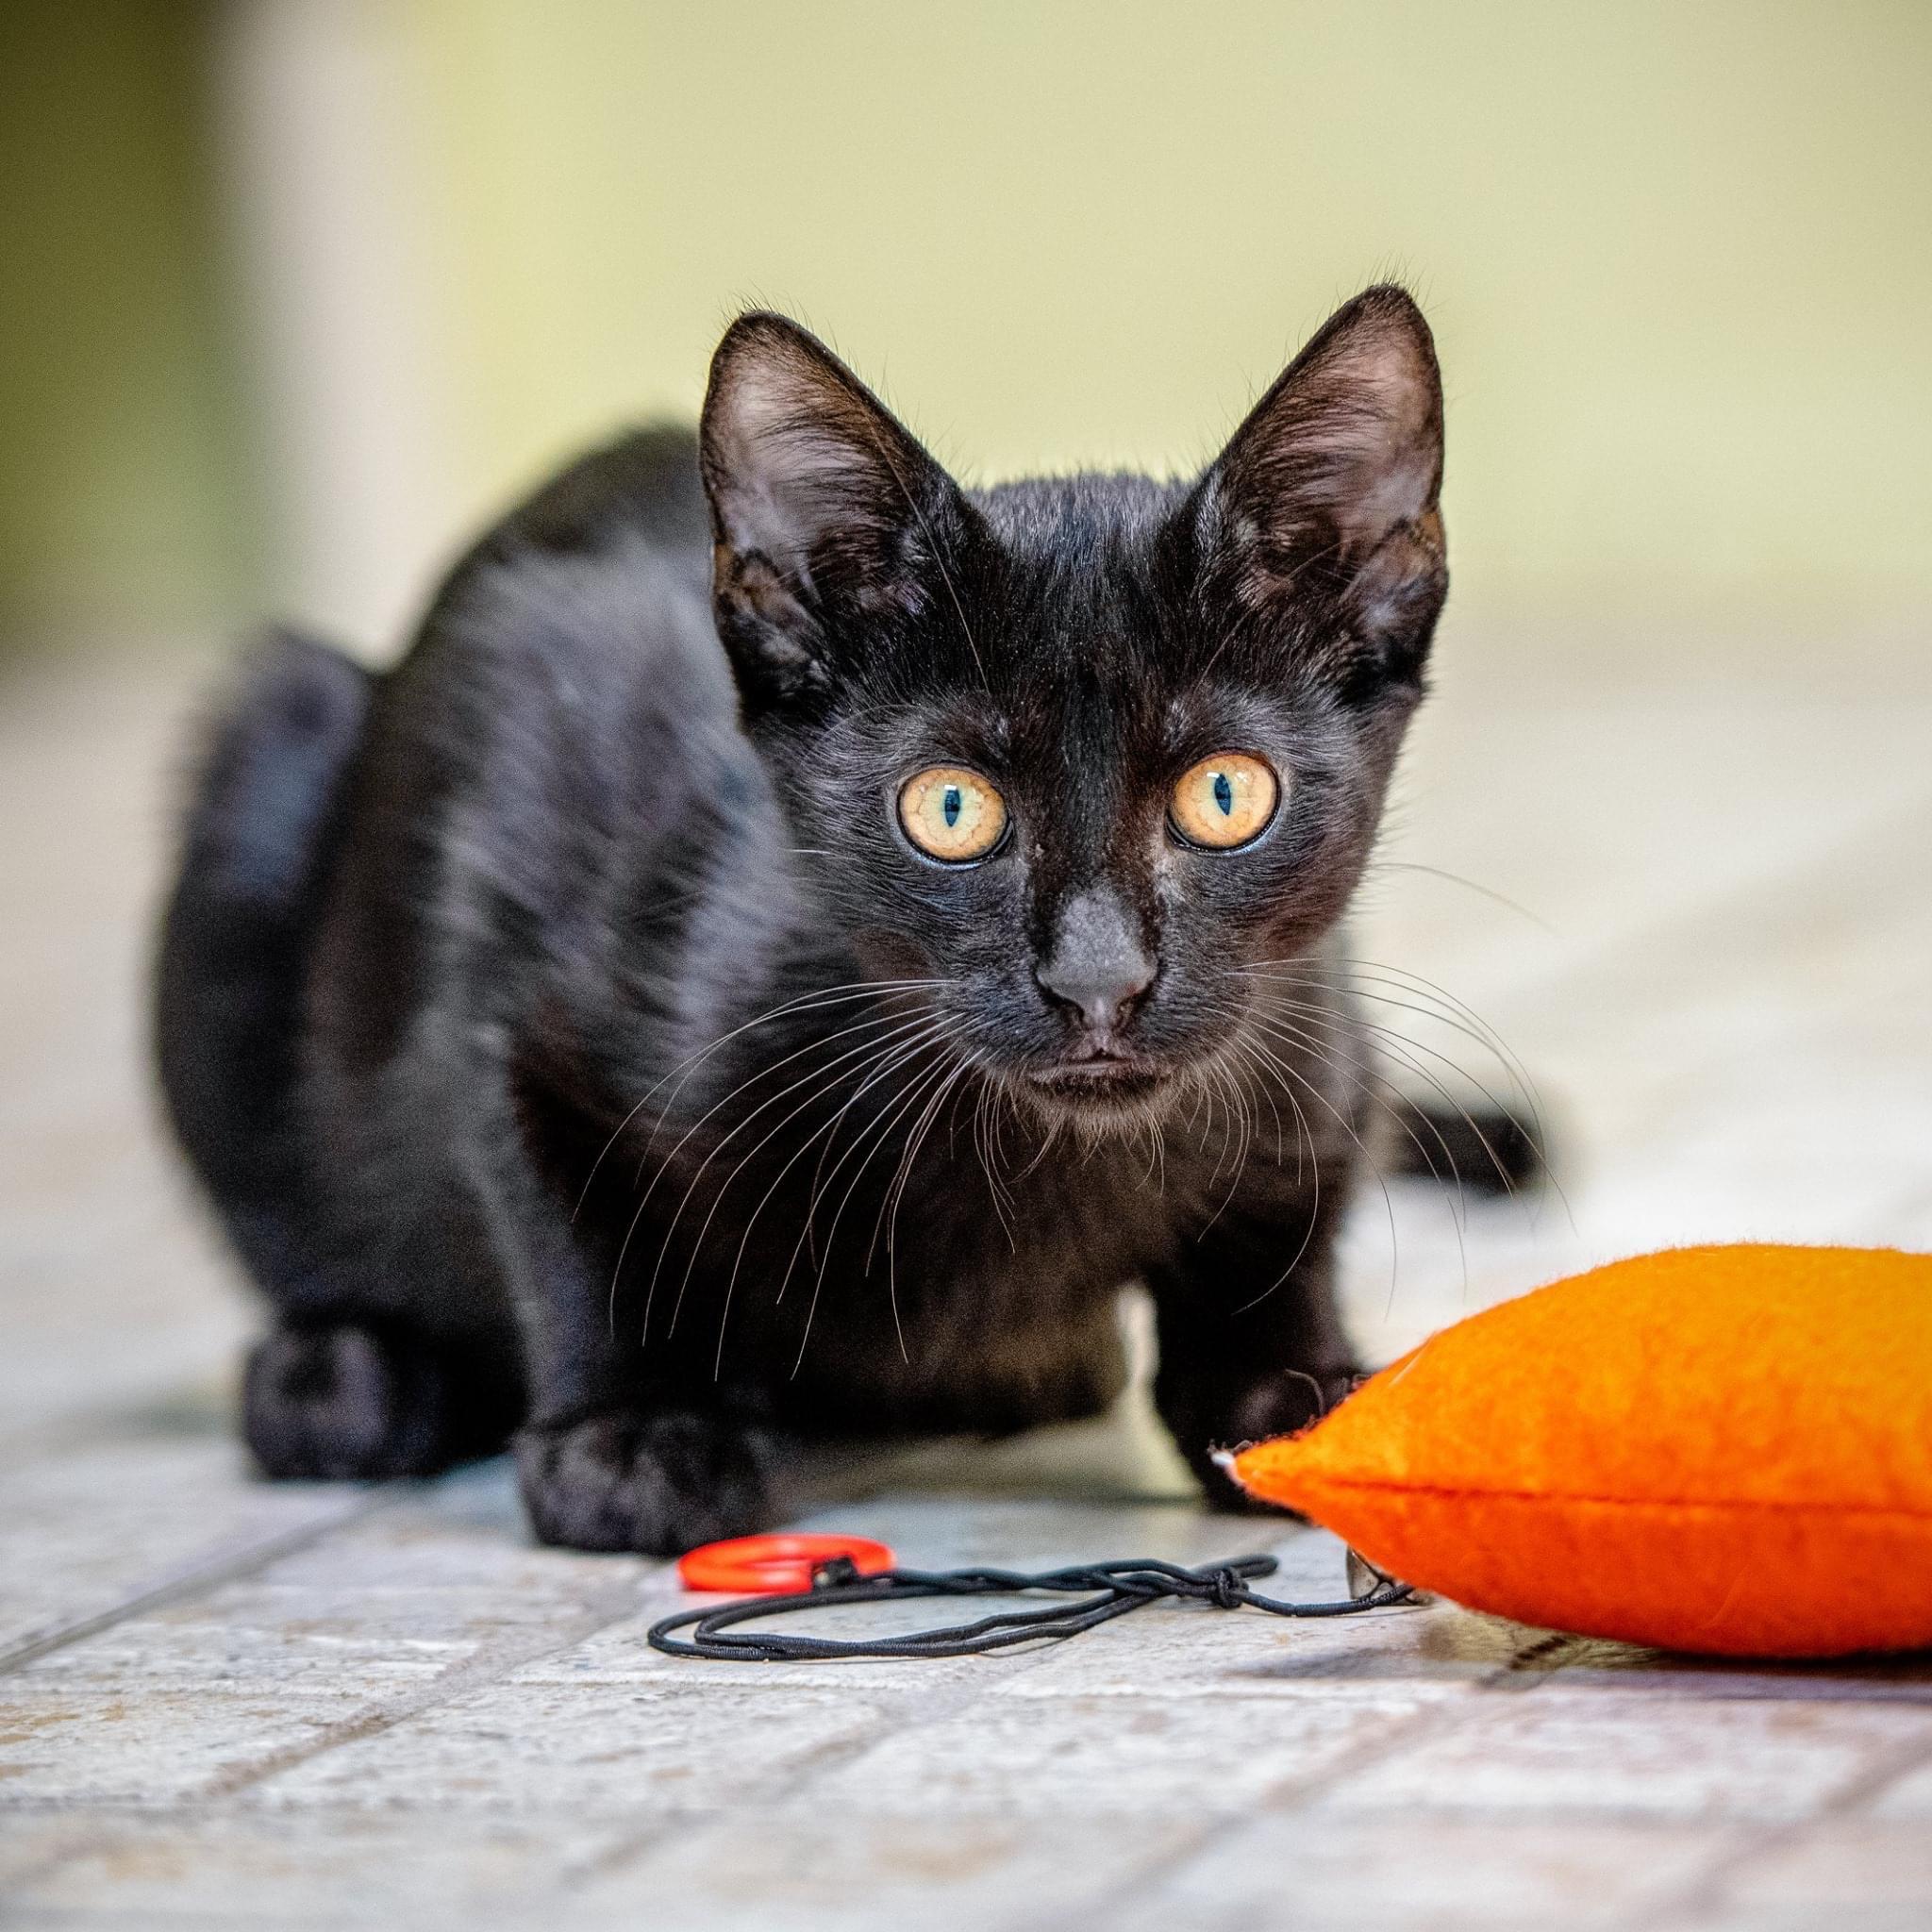 Black cat crouching on floor